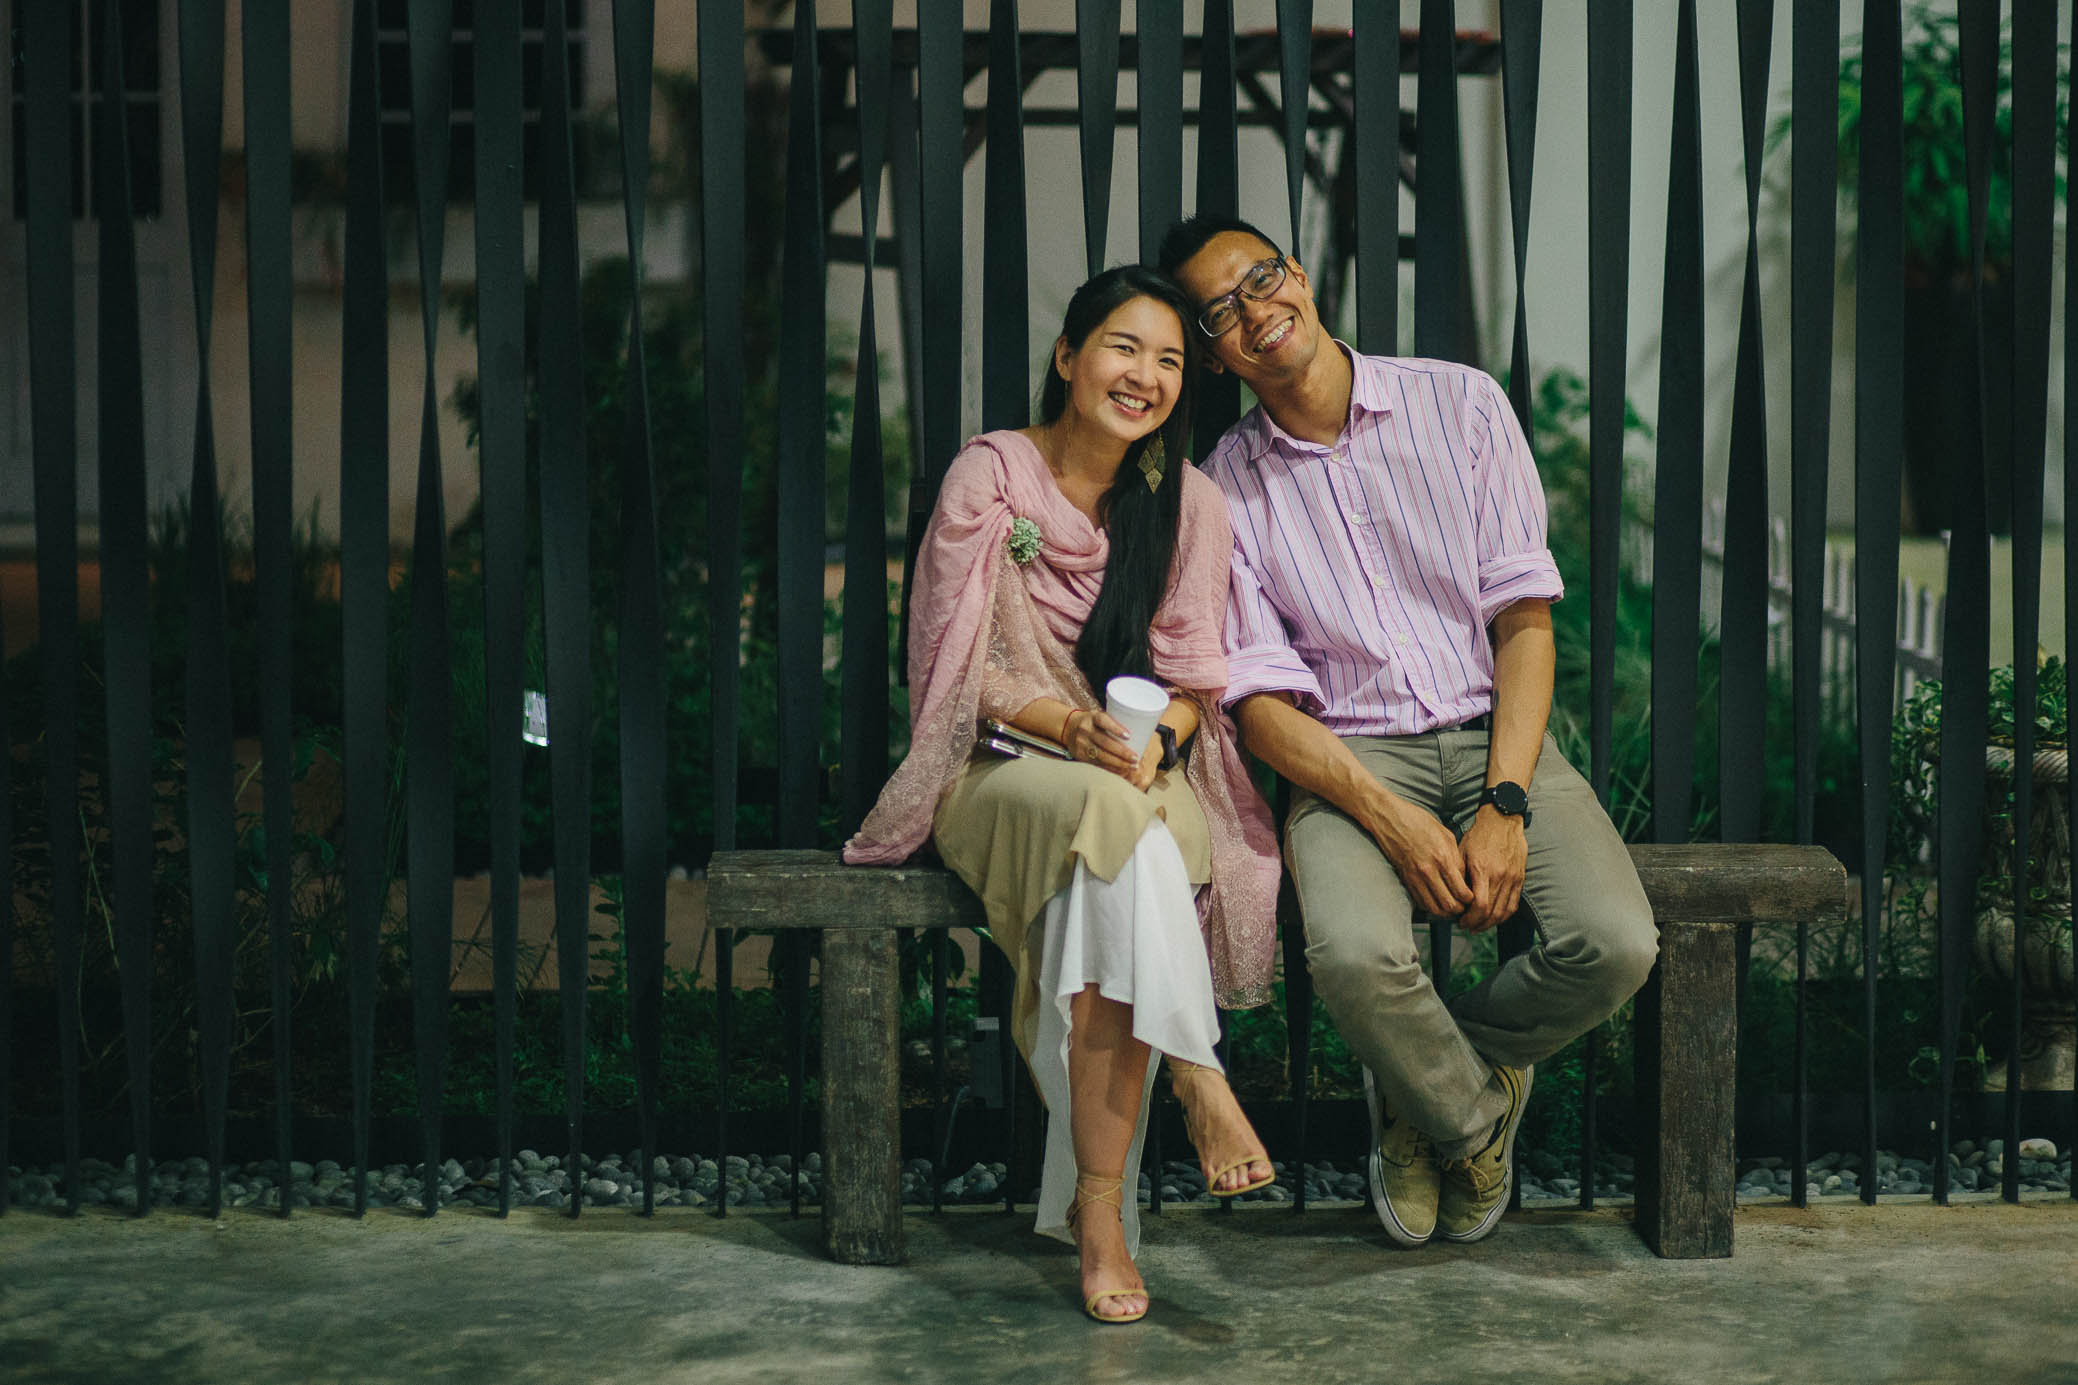 singapore-wedding-photographer-malay-indian-pre-wedding-travel-wmt-2015-alif-ethel-61.jpg